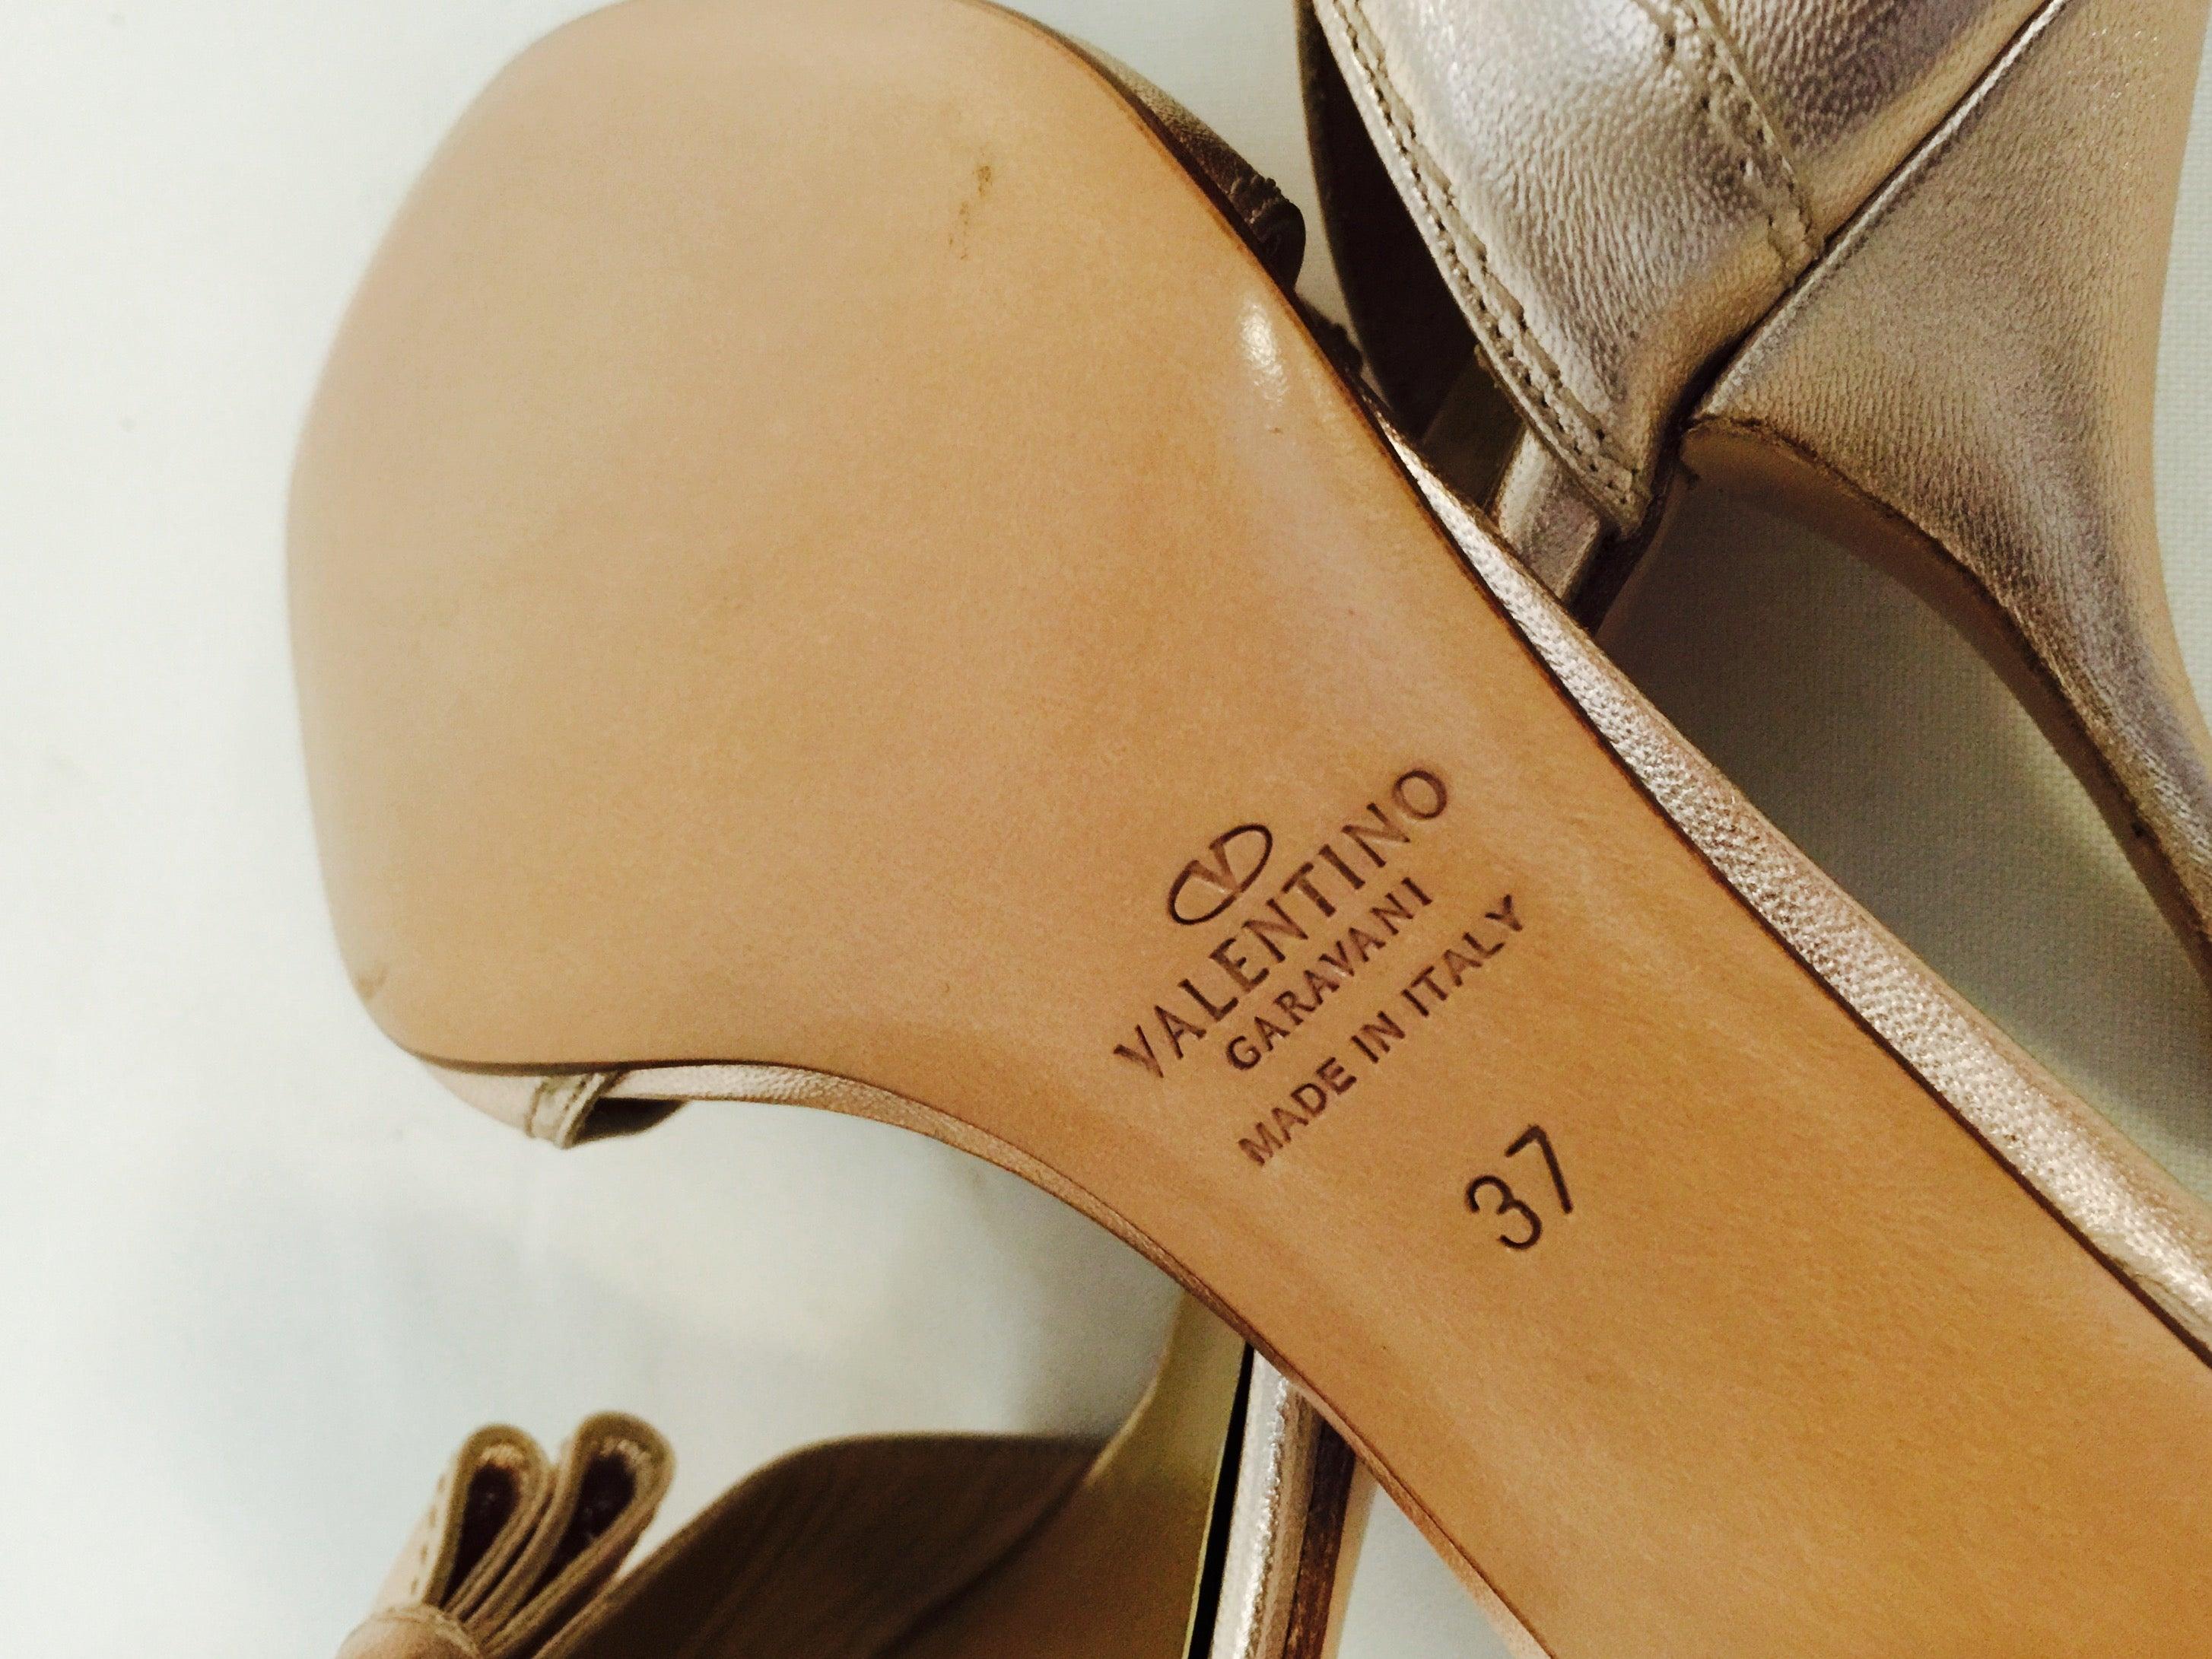 a548e1d333a6 Valentino Garavani Rose Gold Metallic Leather High Heel Sandals For Sale at  1stdibs